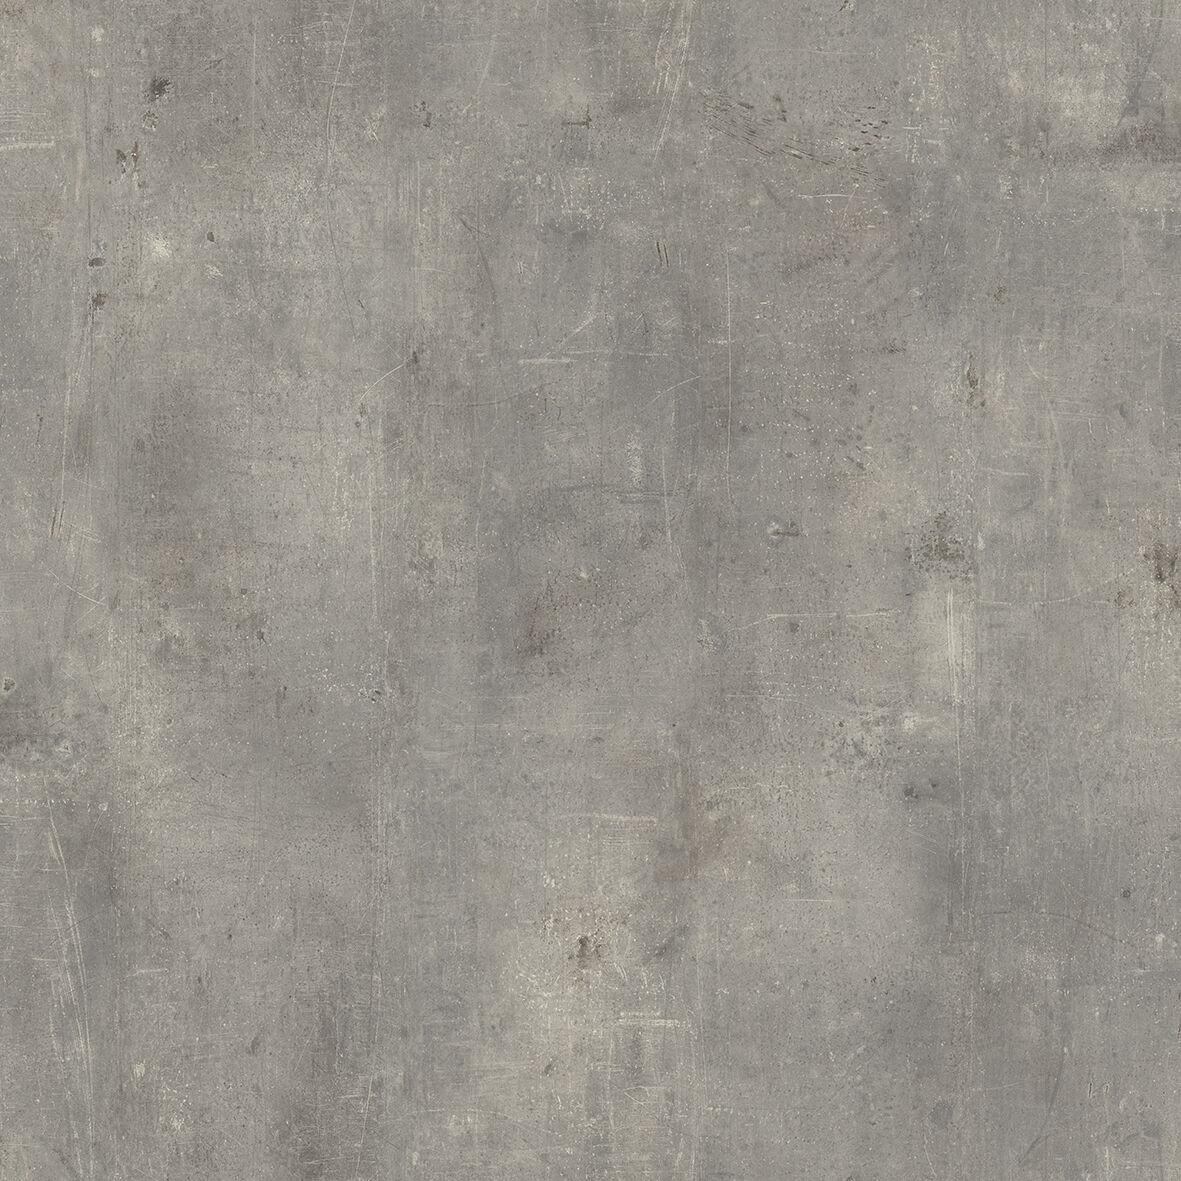 PVC (  m²) CV Bodenbelag Atlantic Zink Beton Design 2 Meter breite